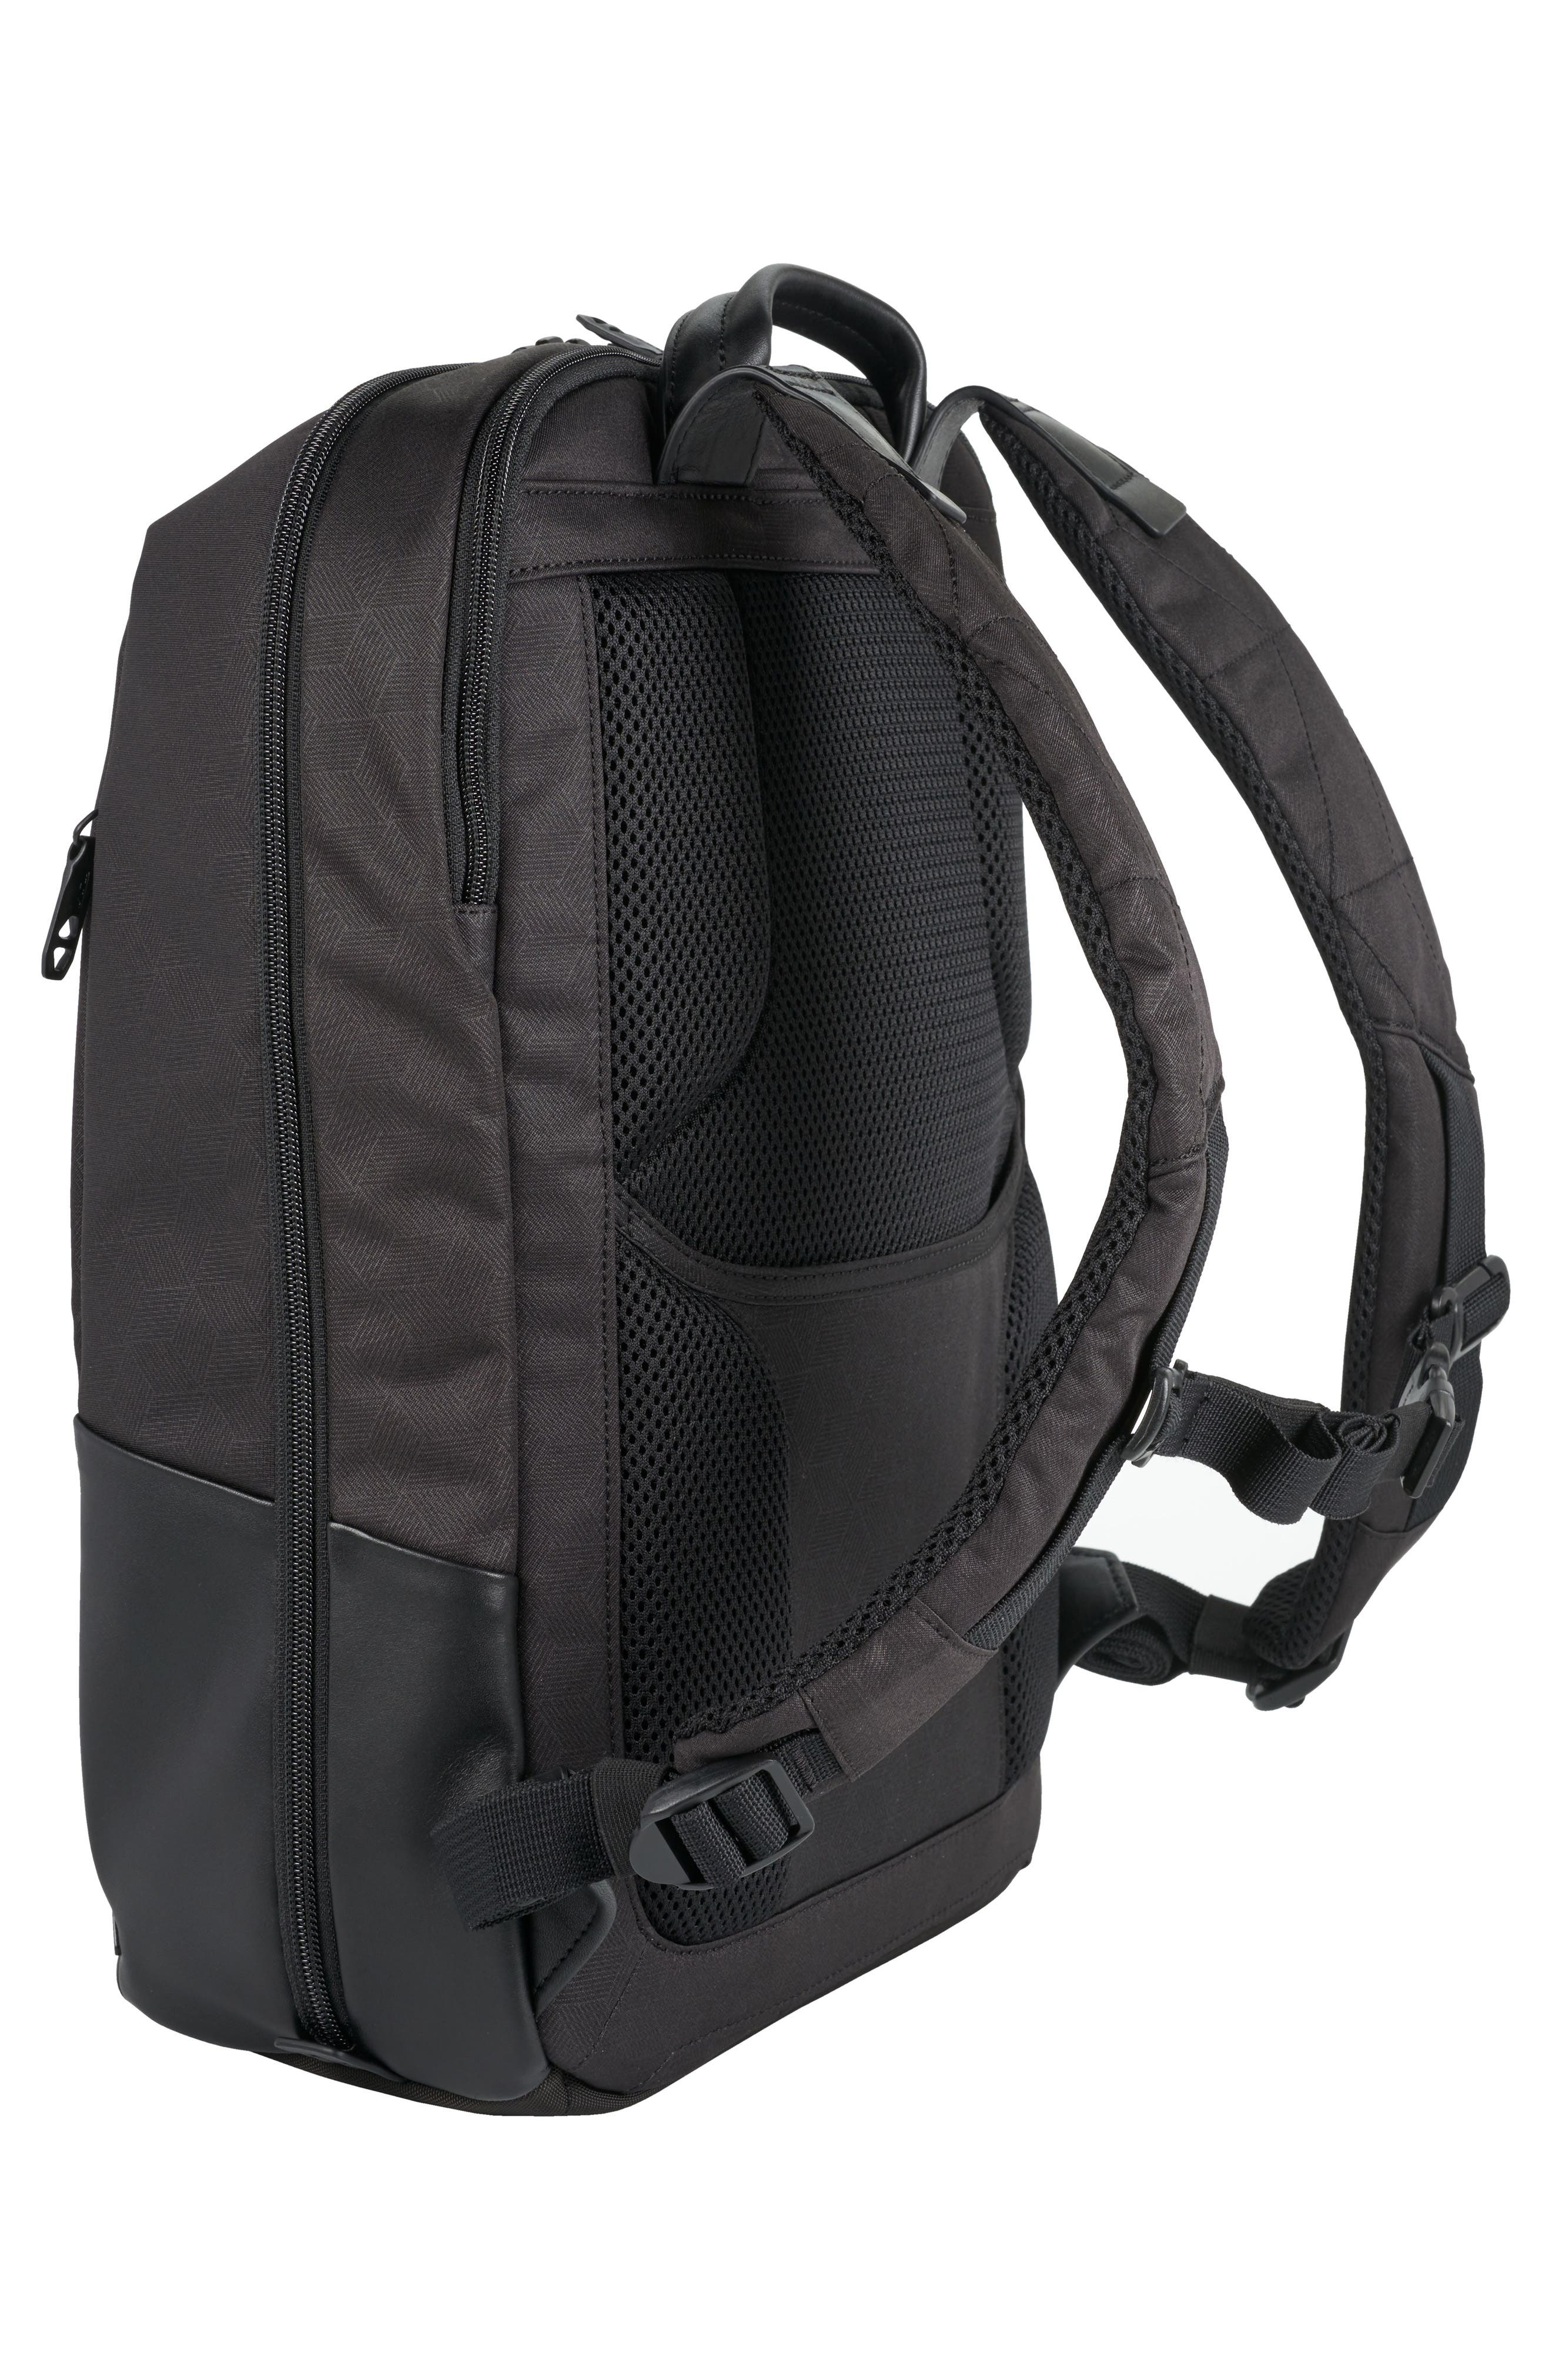 Butler Backpack,                             Alternate thumbnail 5, color,